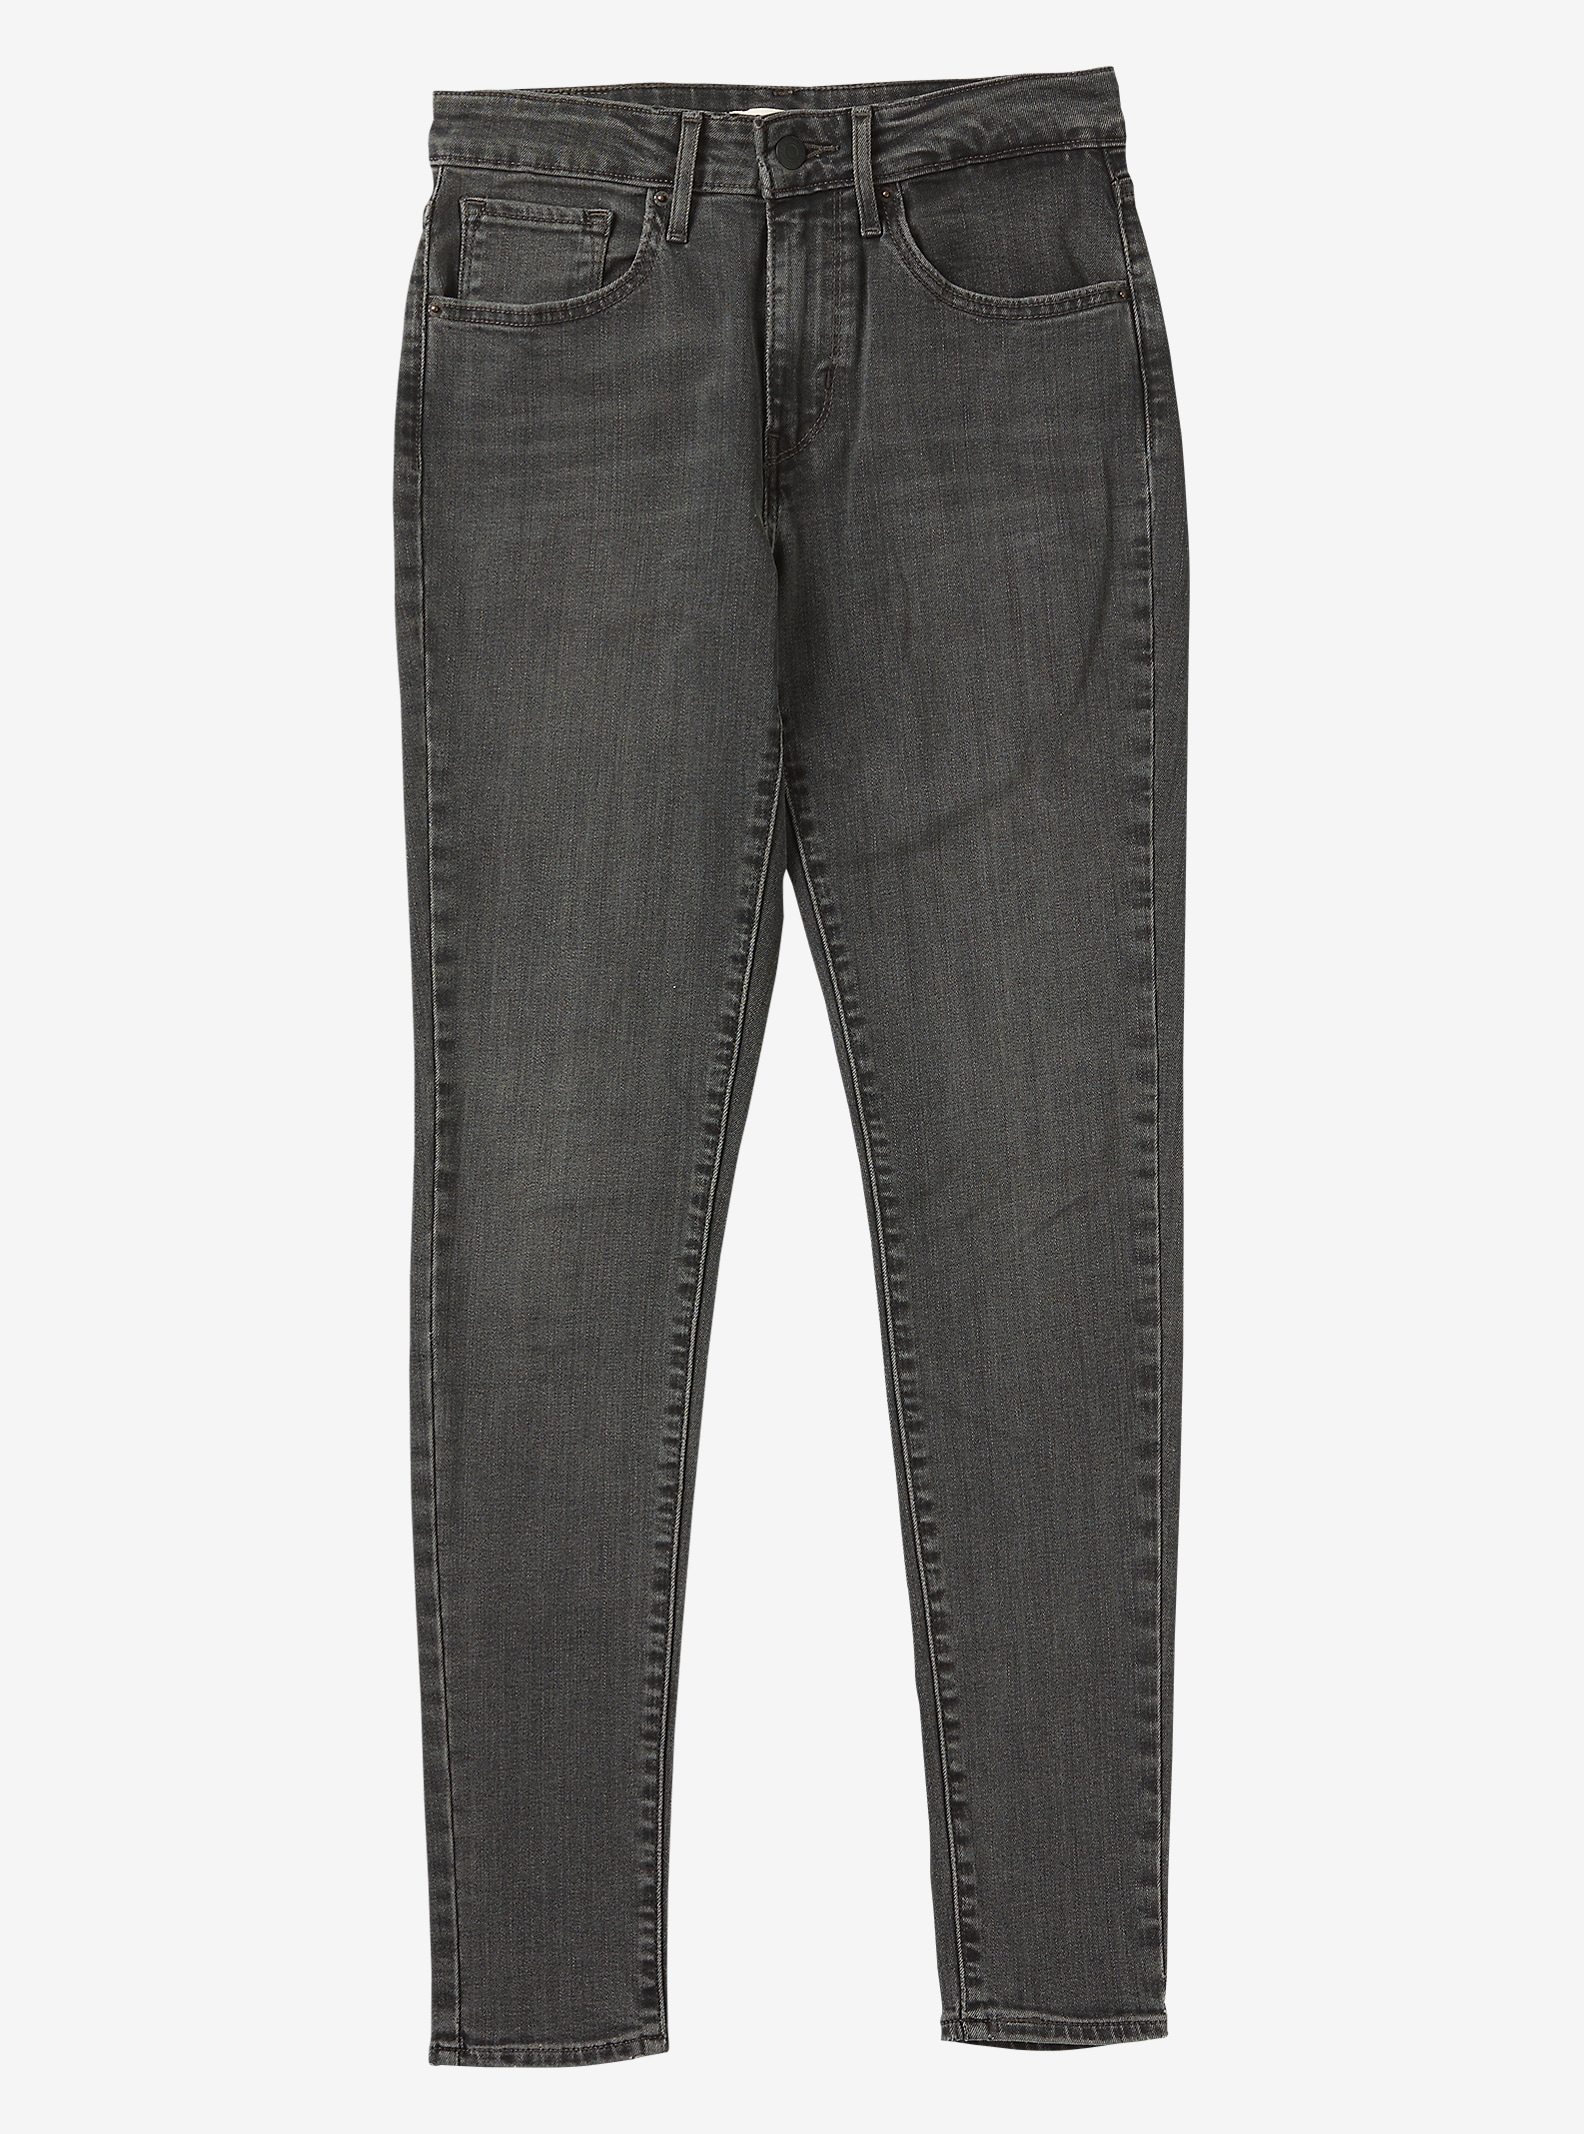 Women's Levi's® 721 High Rise Skinny Jean shown in Grey